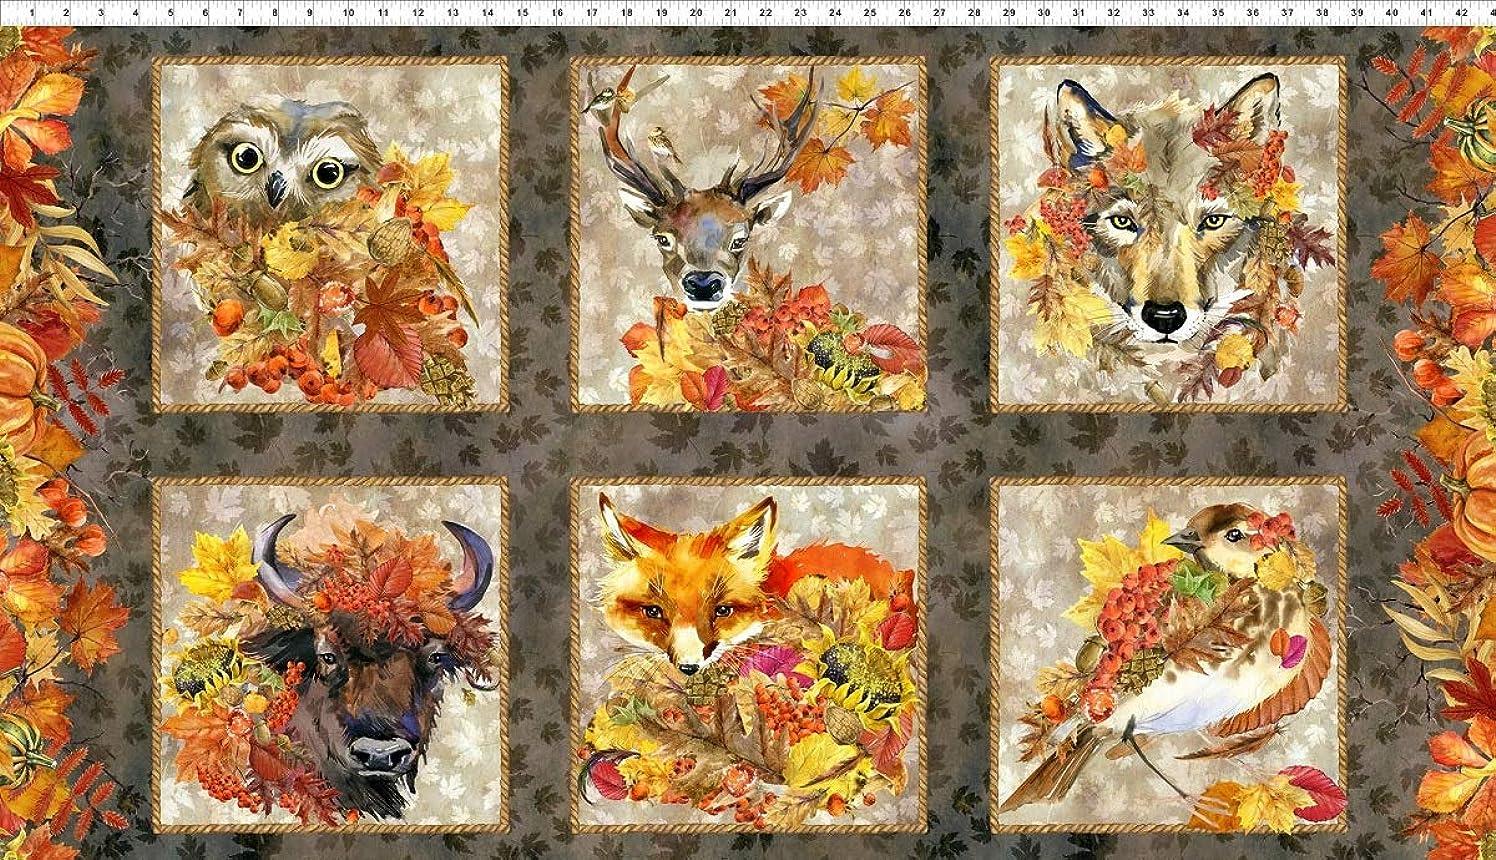 Our Autumn Friends Fabric Panel - Digital Print - 24